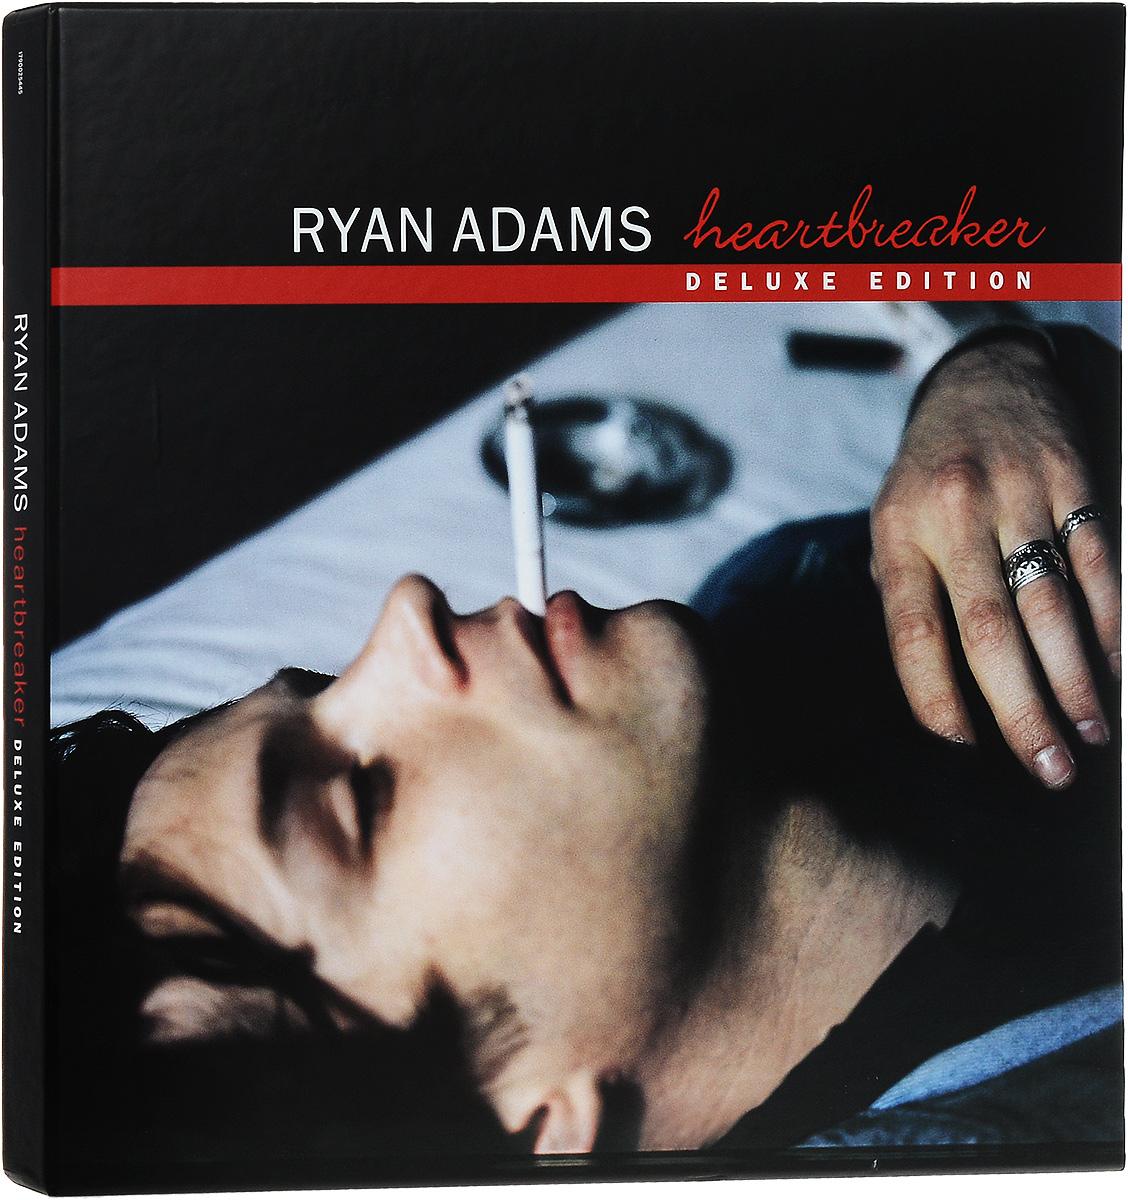 Райан Адамс Ryan Adams. Heartbreaker. Deluxe Edition (4 LP + DVD) райан адамс ryan adams 1989